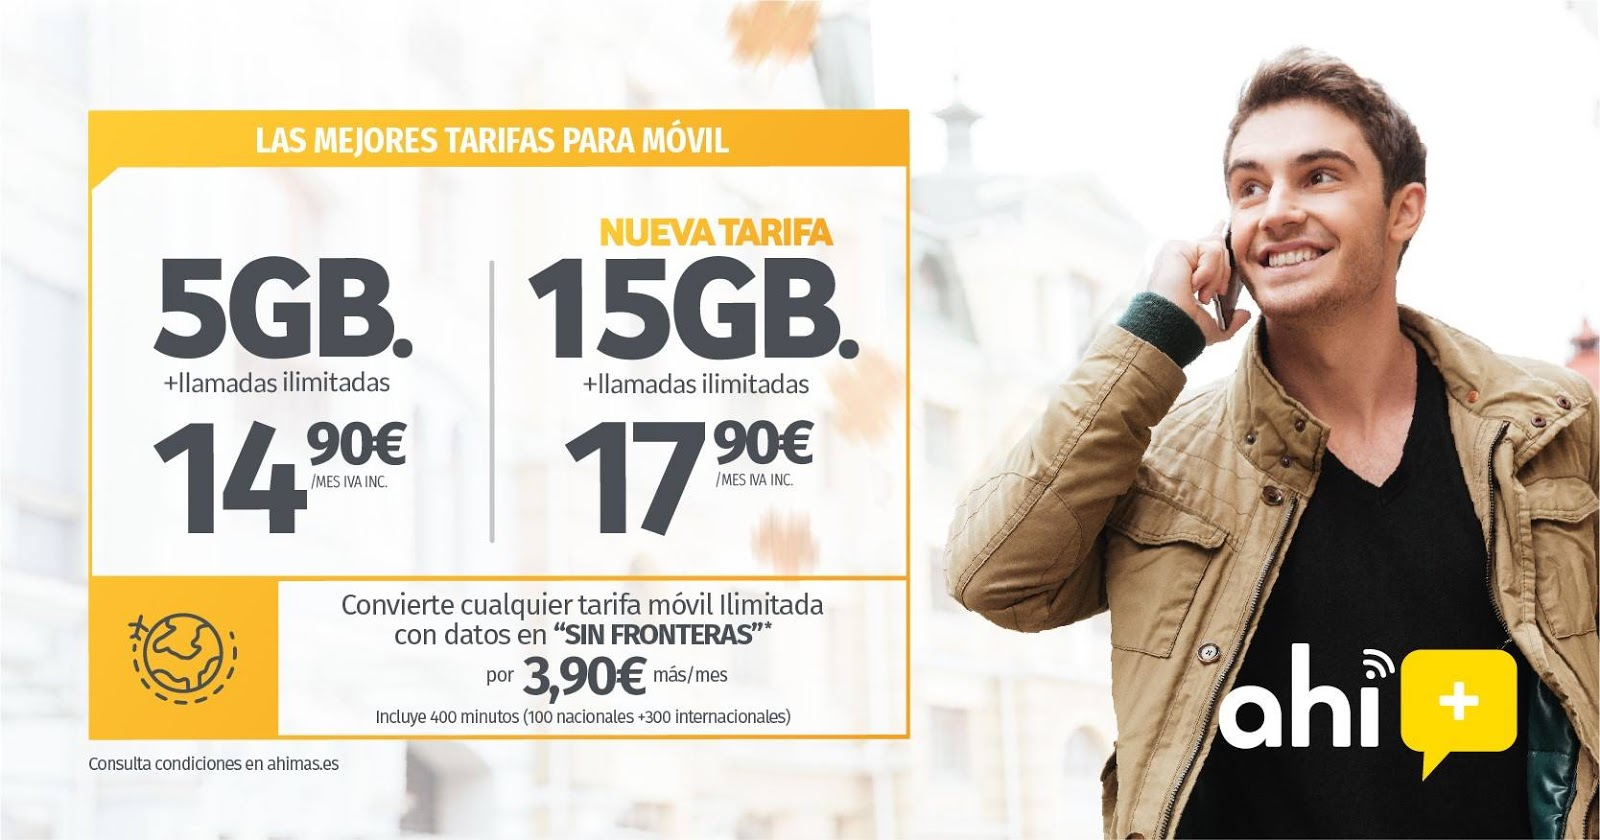 Nueva tarifa 15 GB Ahí+